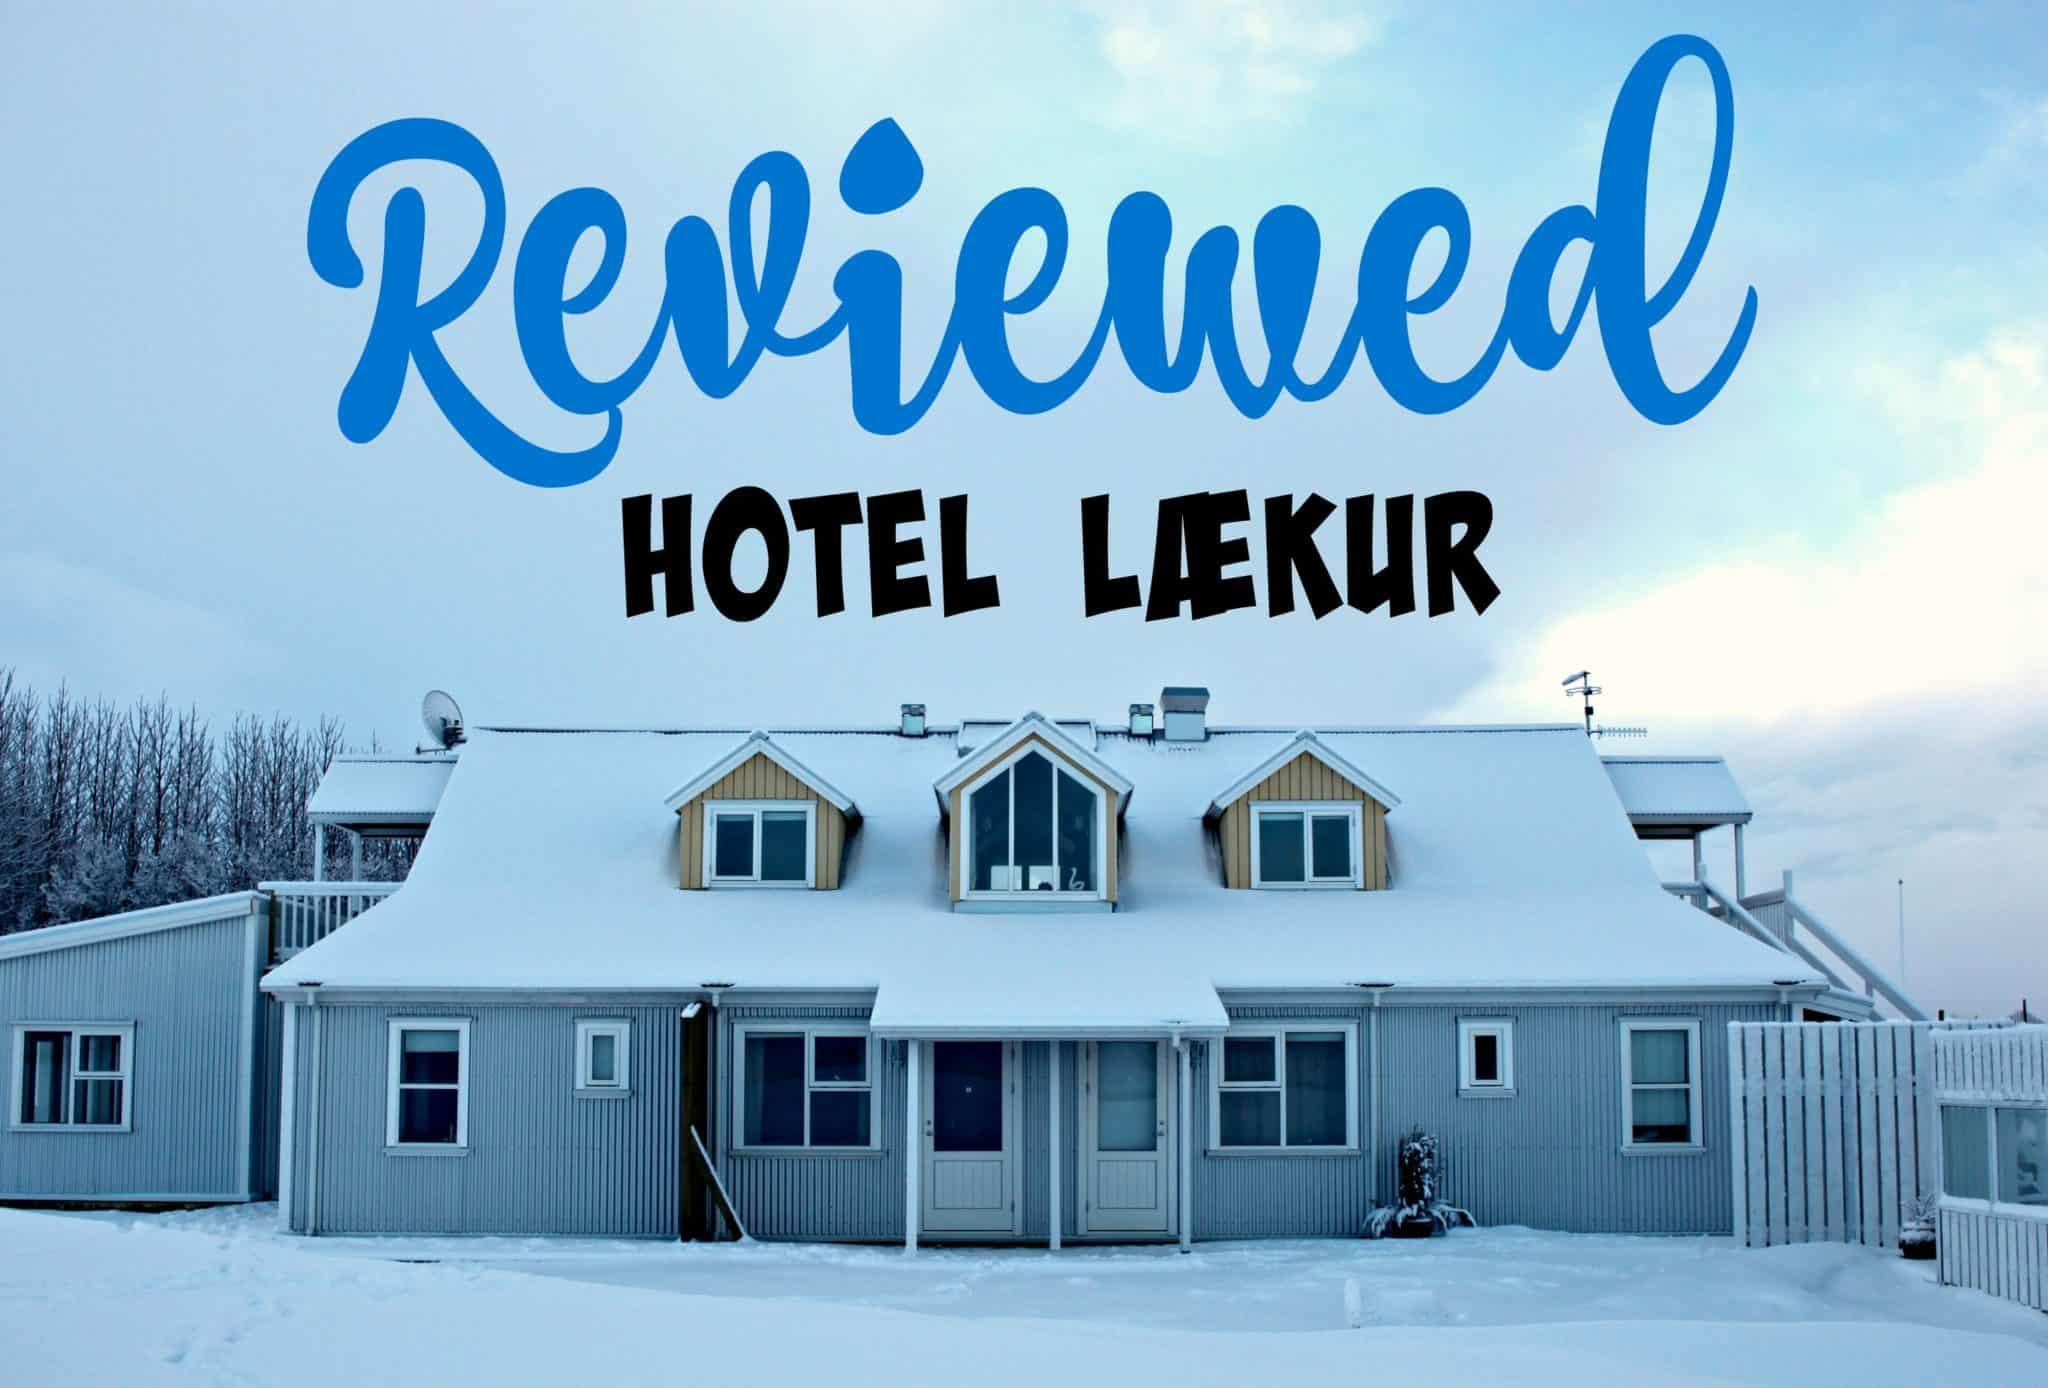 Reviewed: Hotel Lækur, Hella, Iceland Accommodation | My Travel Monkey